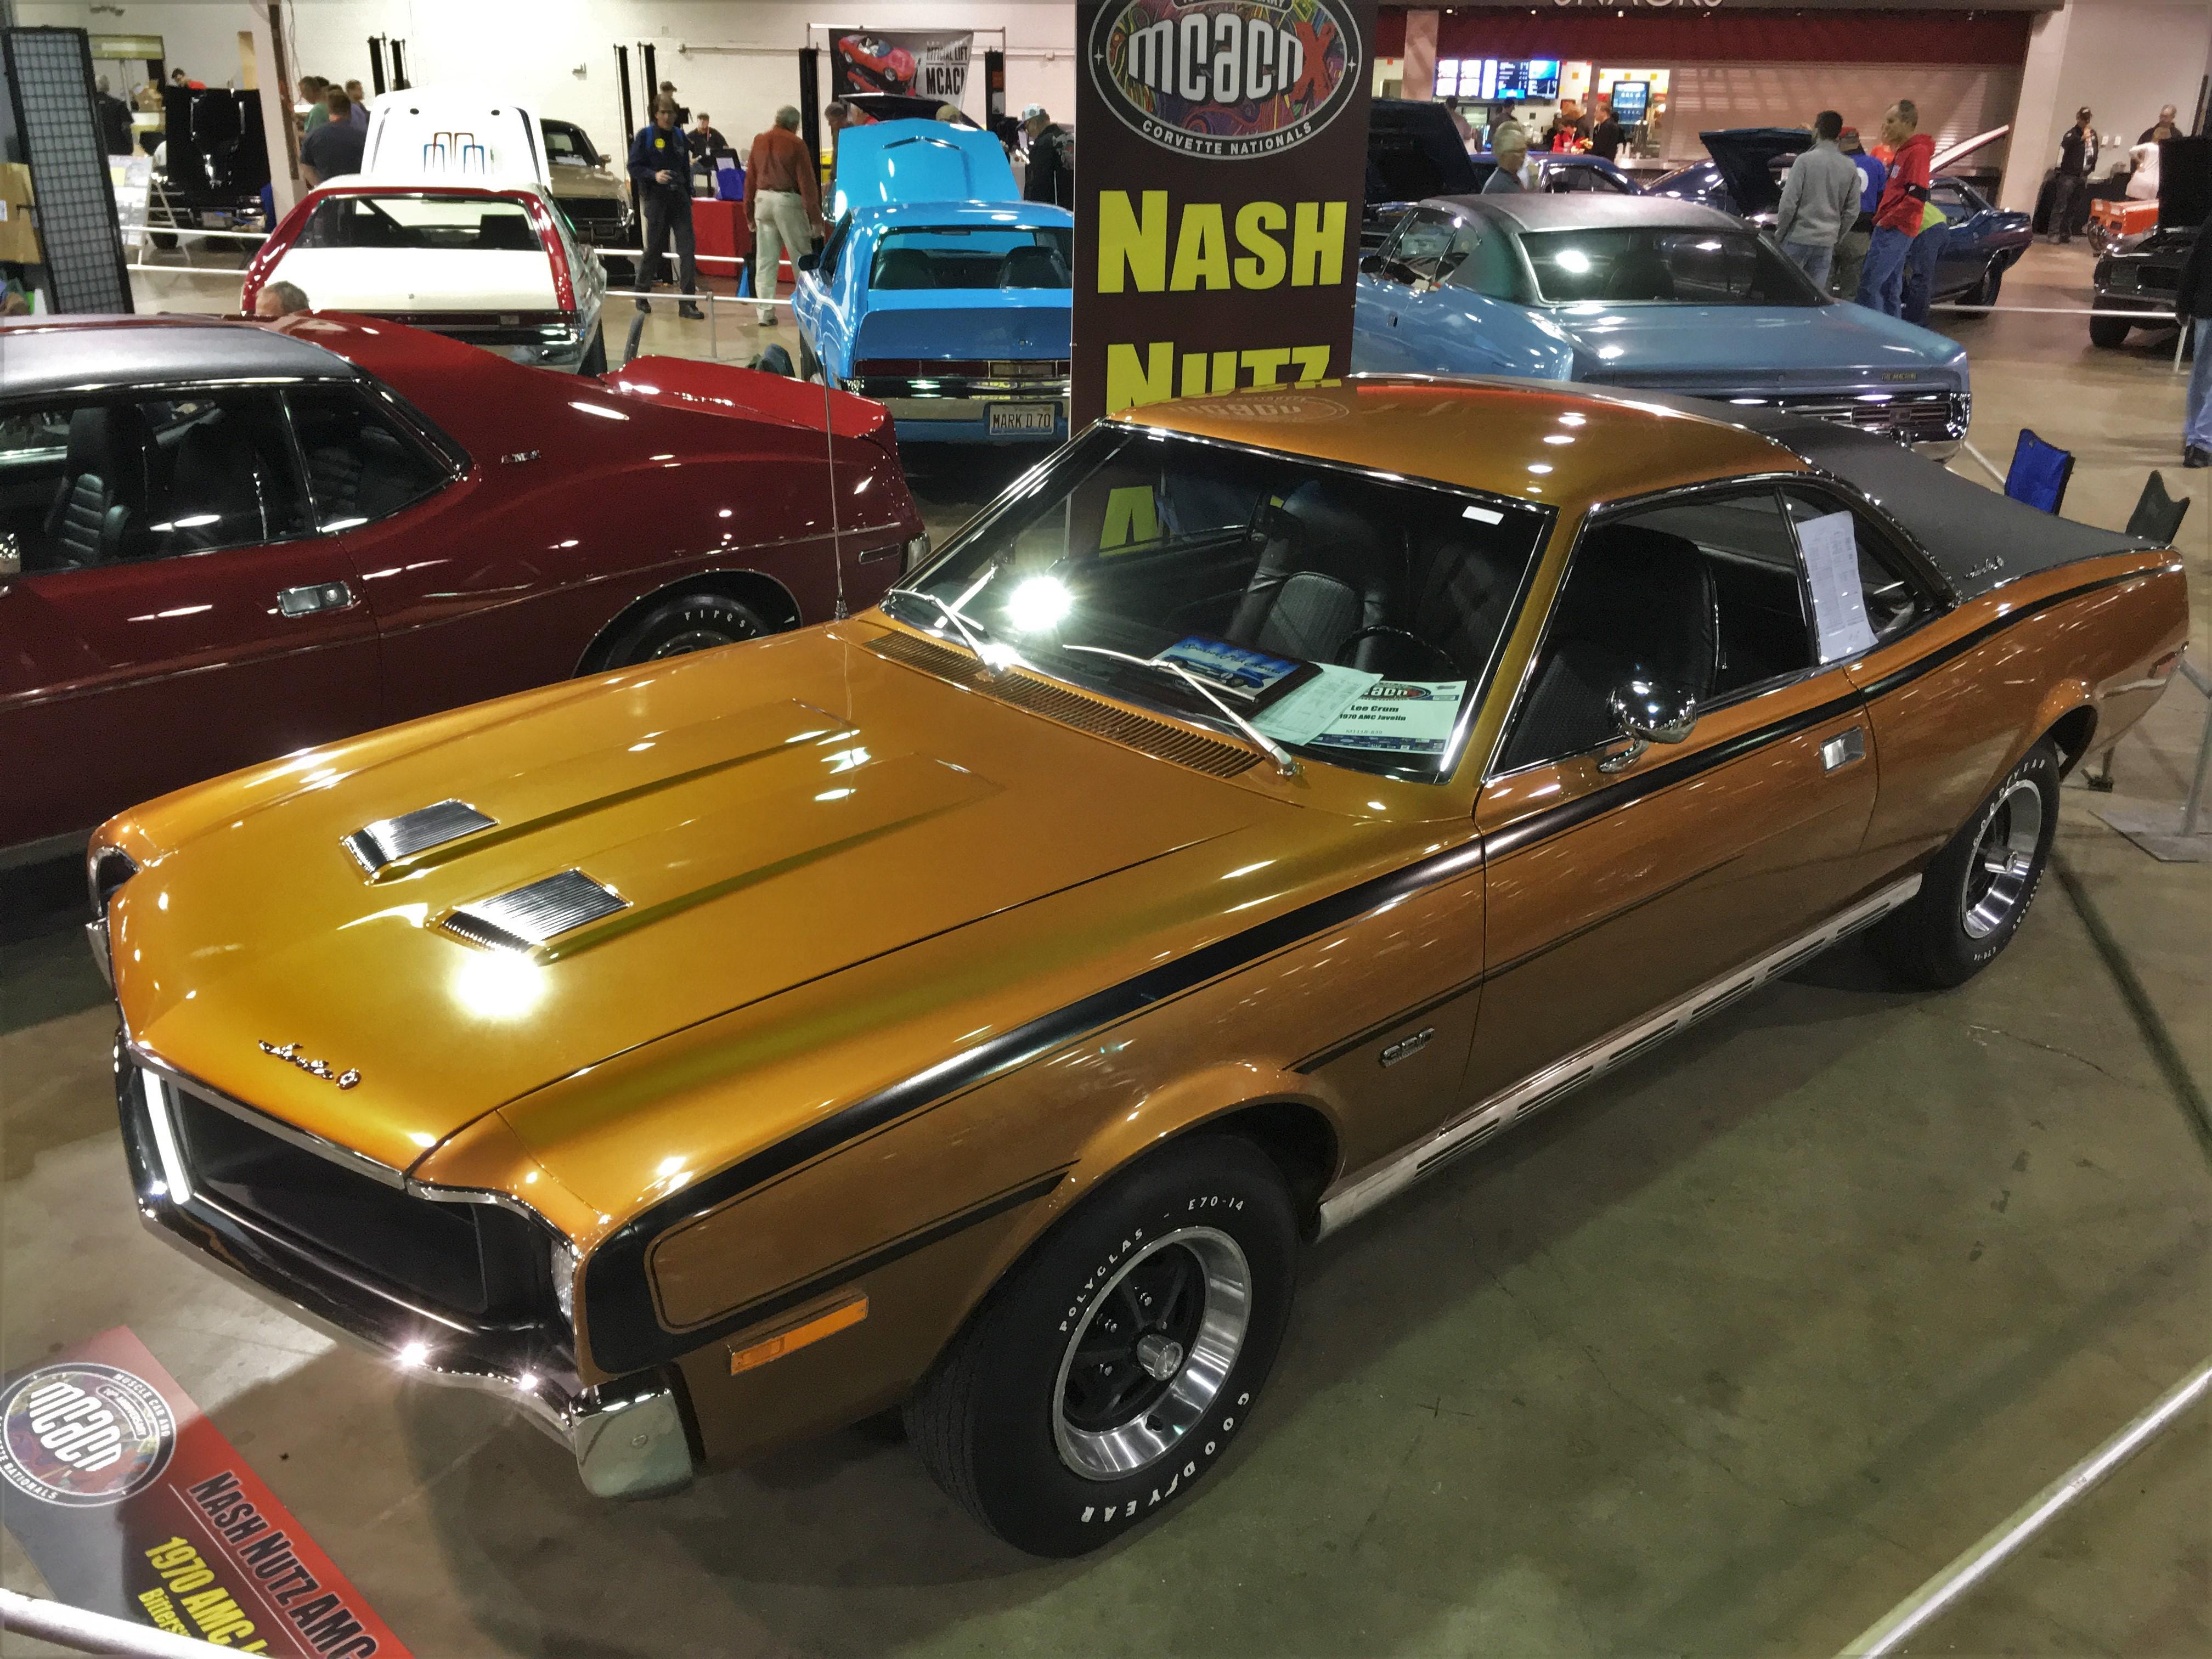 Muscle Car and Corvette Nationals, Bill picks 10 from the Muscle Car and Corvette Nationals, ClassicCars.com Journal